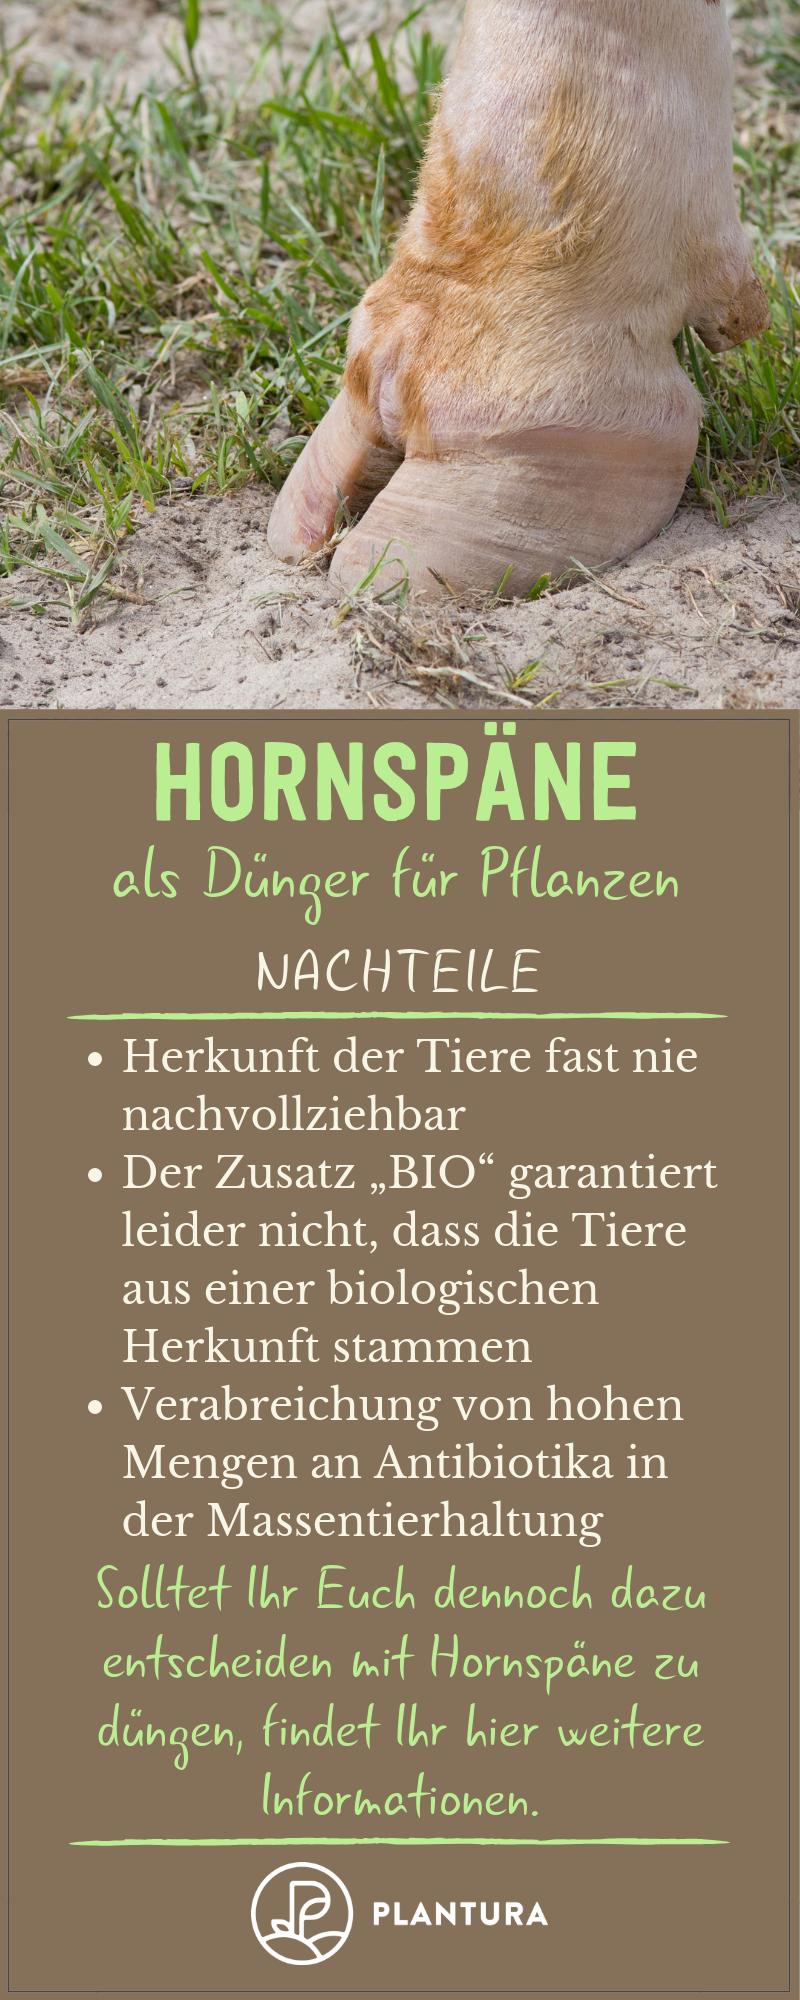 Hornspane Anwendung Wirkweise Als Dunger Plantura Garten Umgraben Pflanzen Gartendunger